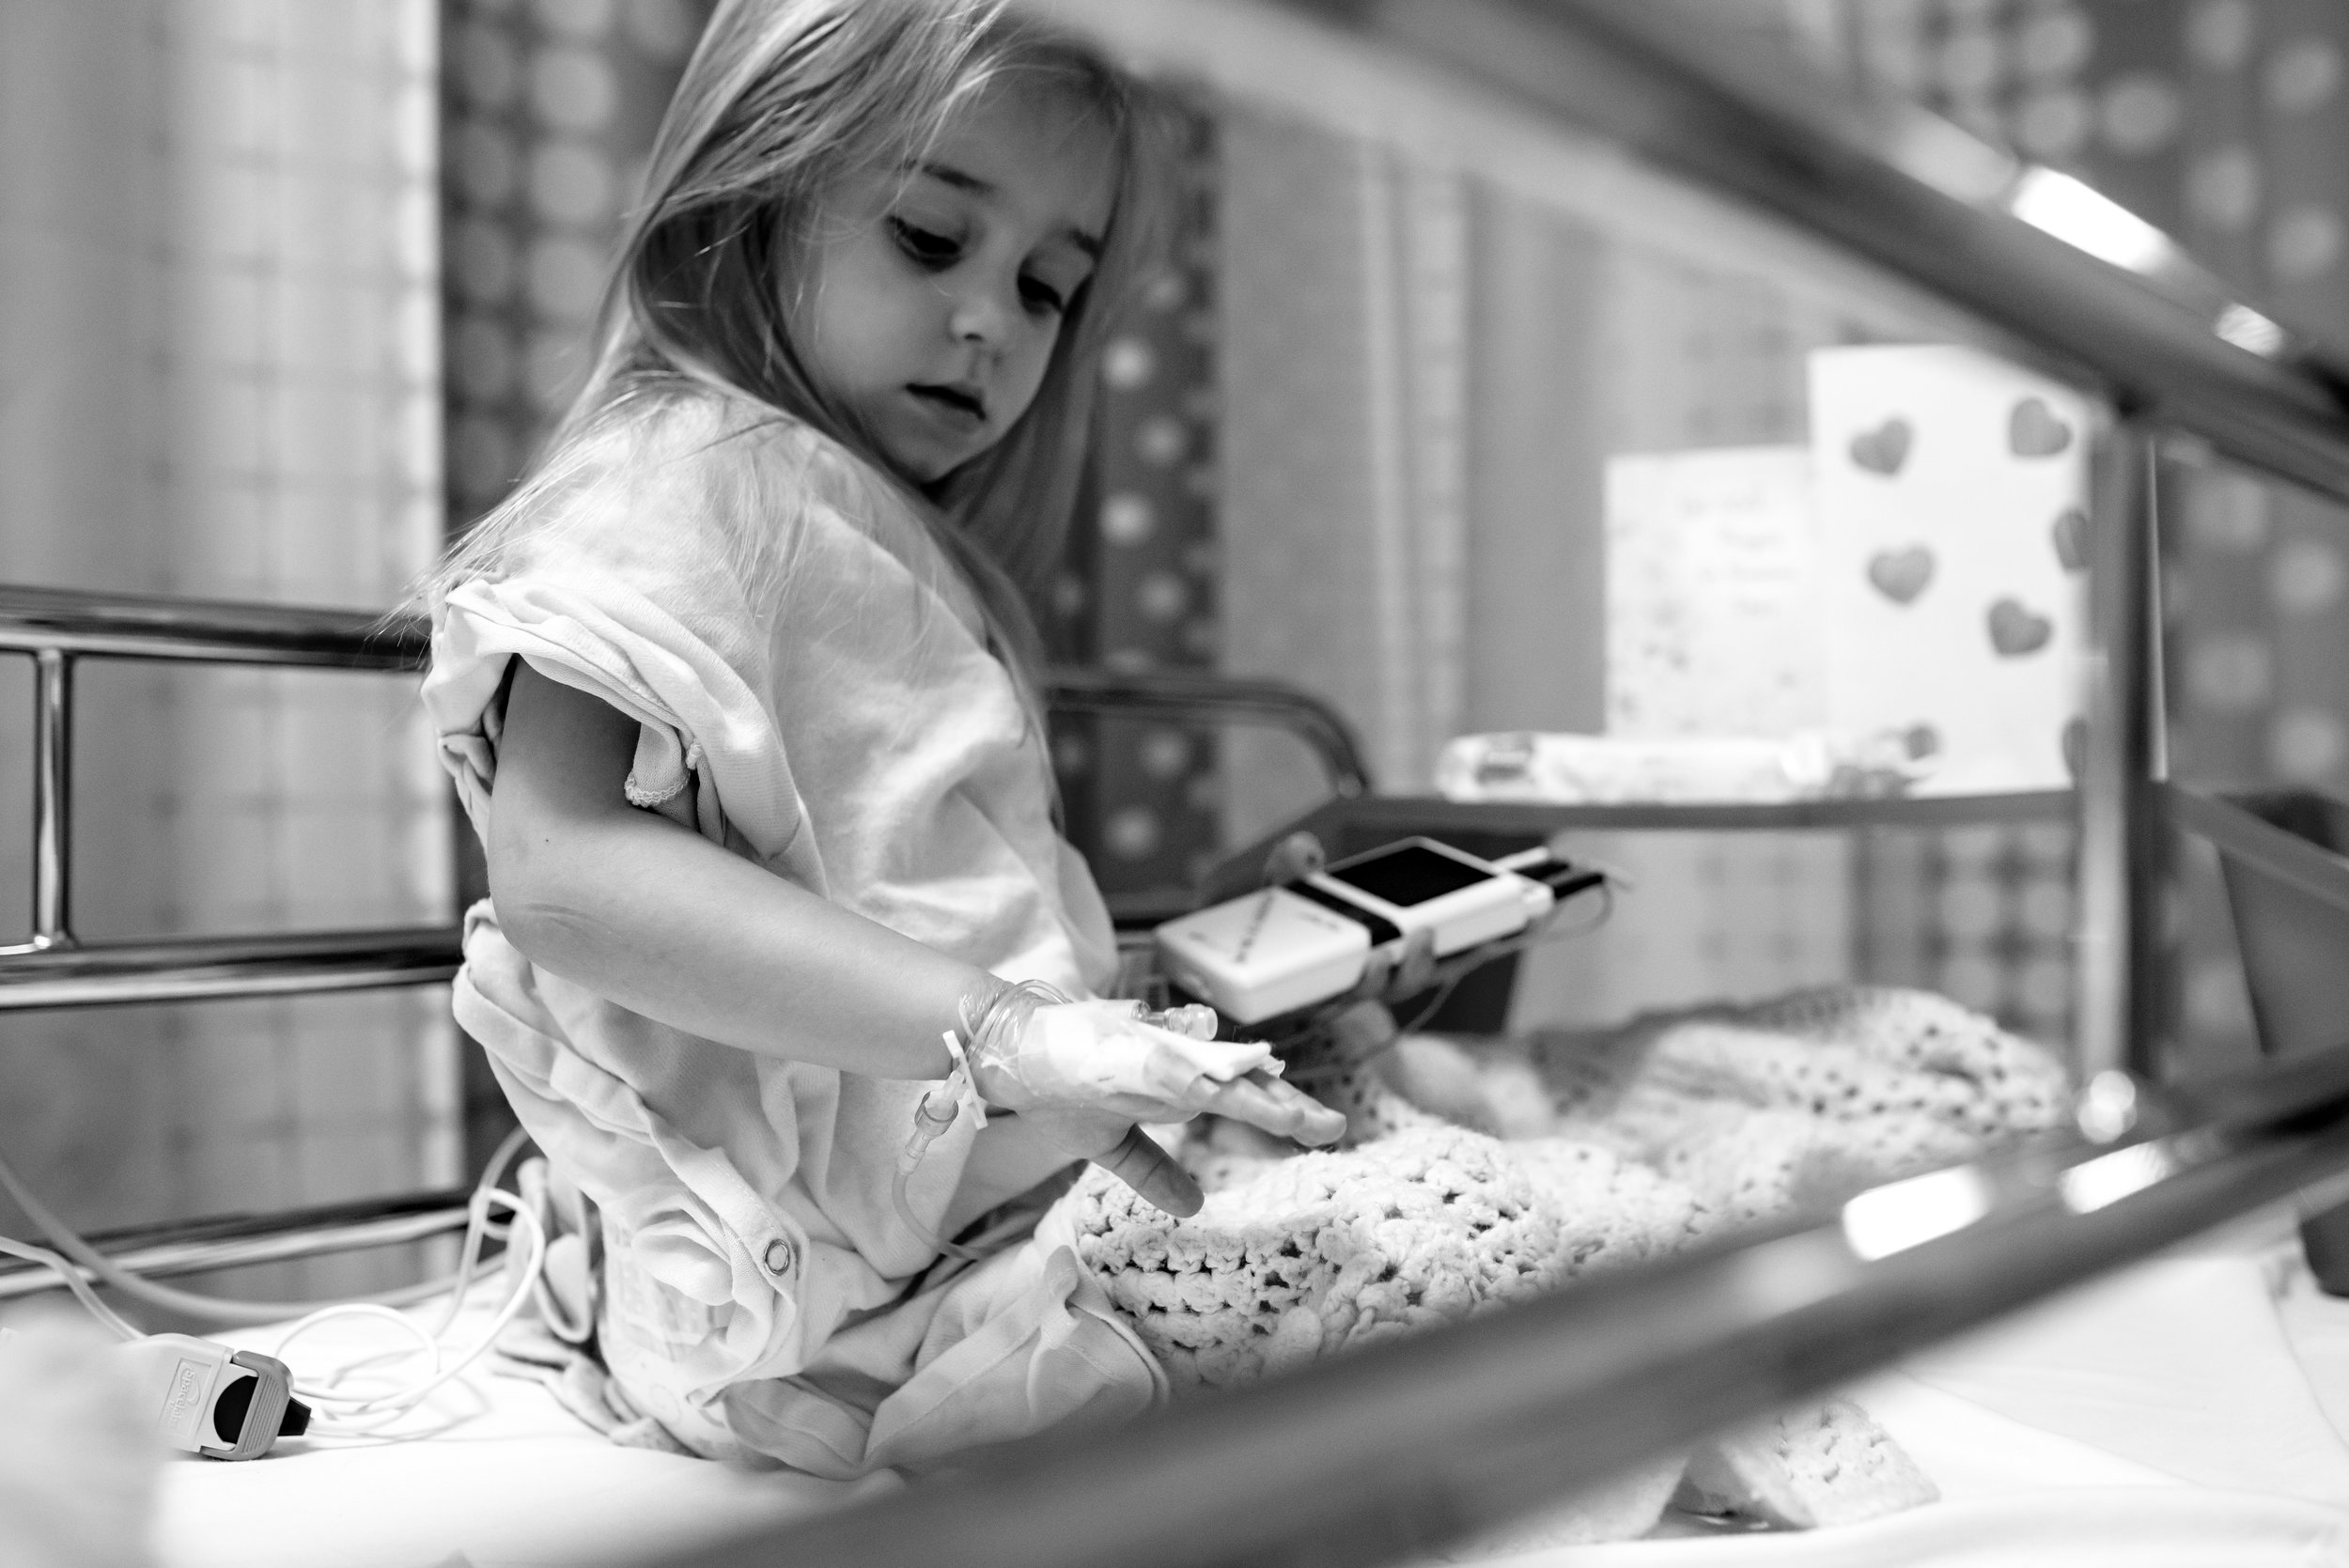 Girl looks at IV port and EKG monitor after congenital heart defect repair procedure